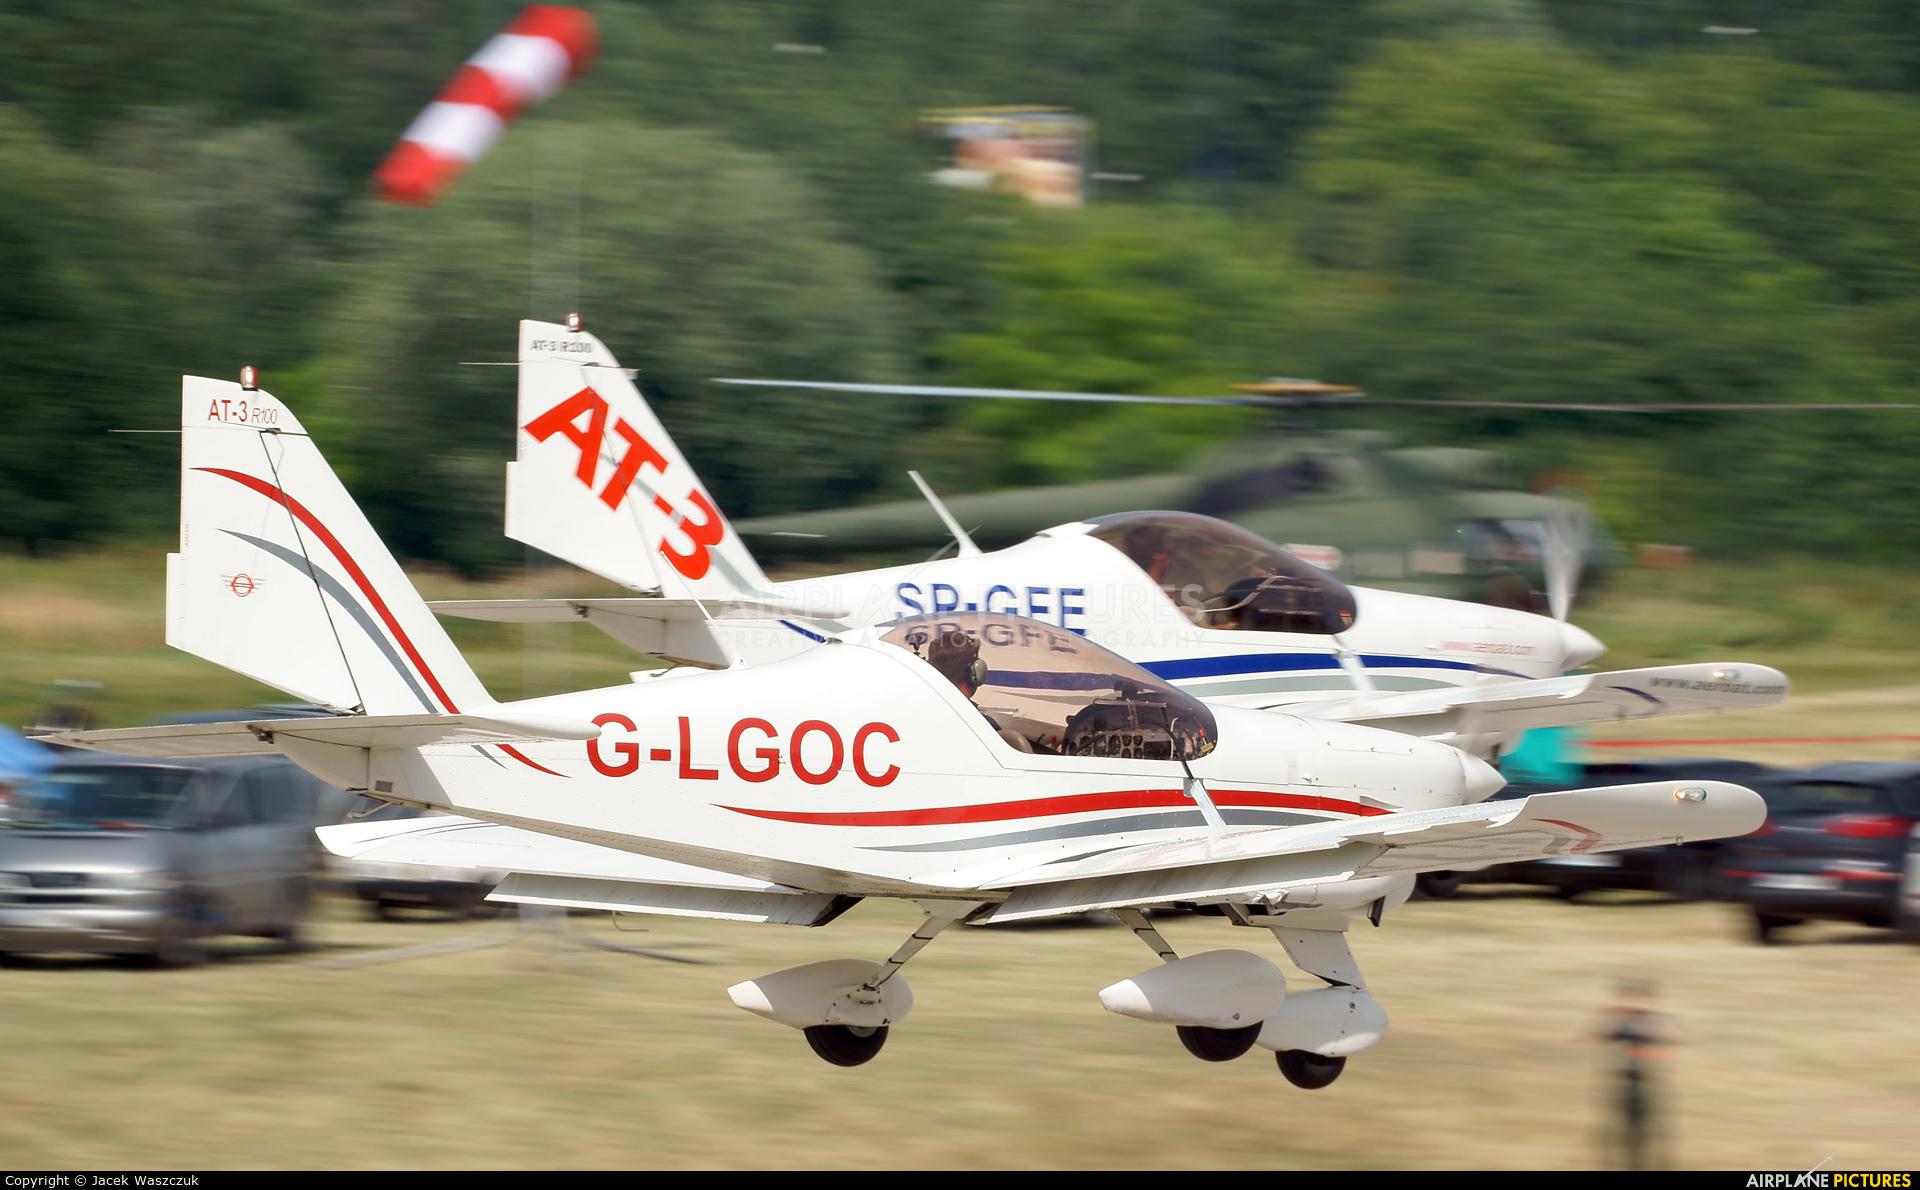 3AT3 Formation Flying Team G-LGOC aircraft at Kraków, Rakowice Czyżyny - Museum of Polish Aviation